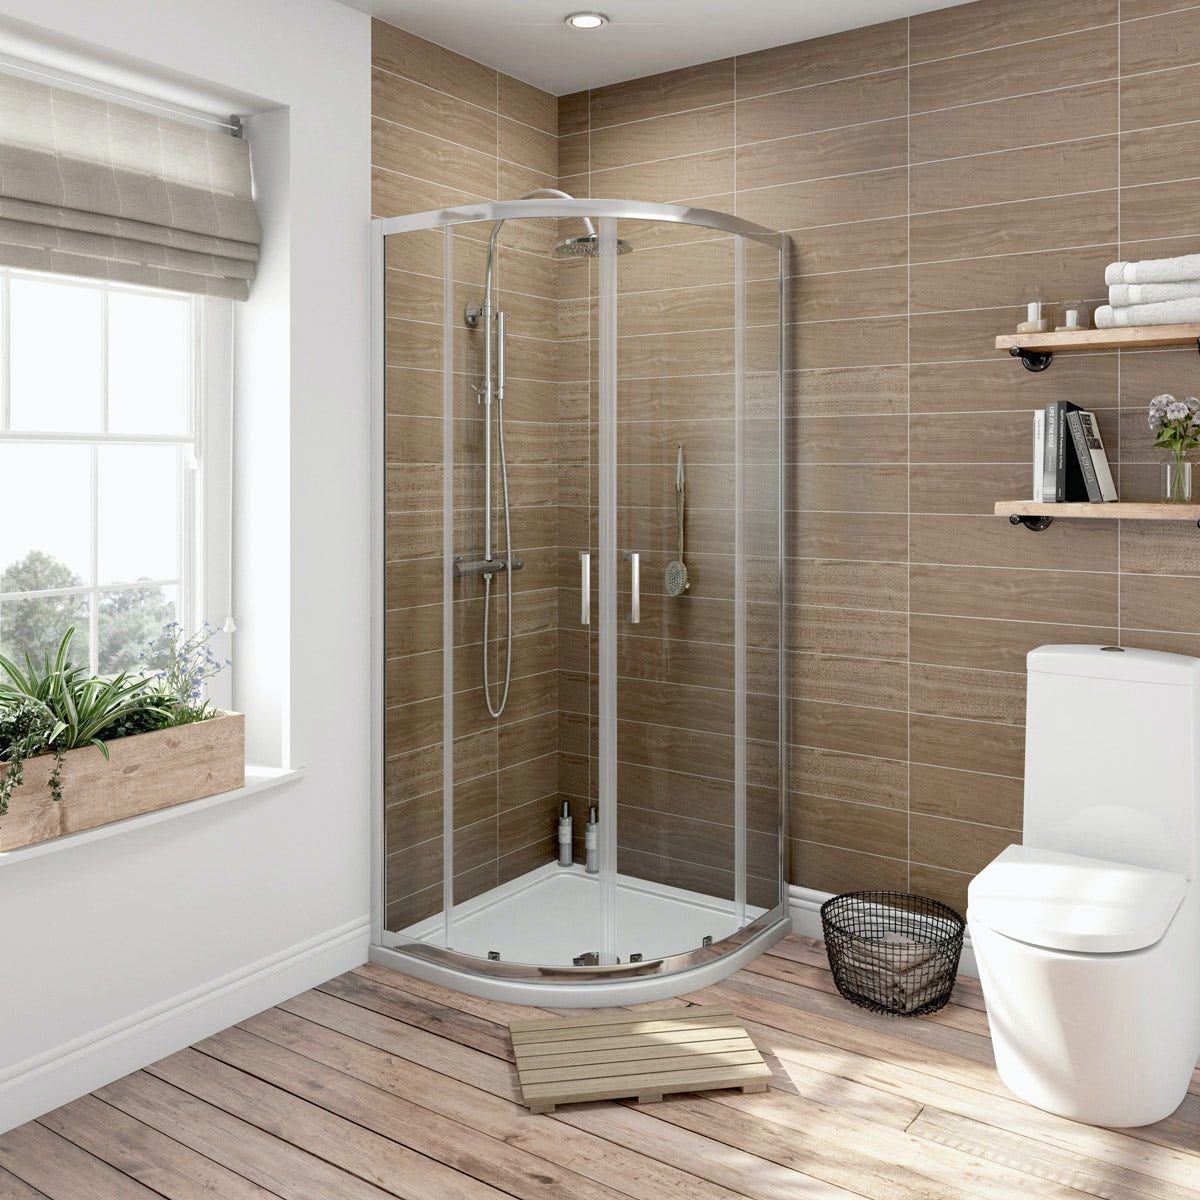 6mm sliding door quadrant shower enclosure